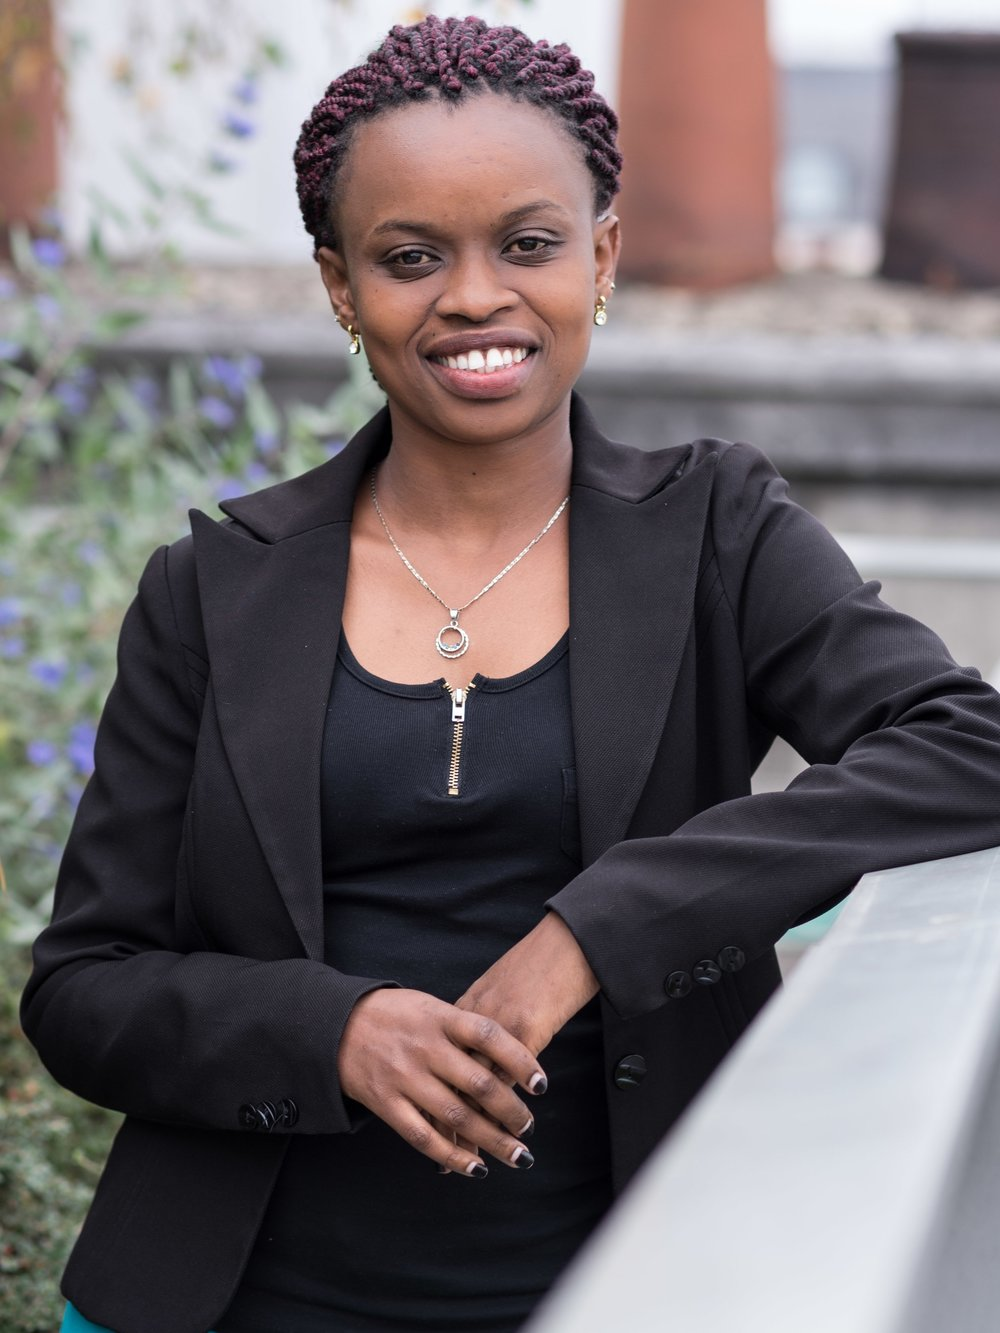 Milanoi Koiyiet - Nationality: KenyanLiving in: Nairobi, KenyaTwitter: @mila_evelynFacebook: @milanoik